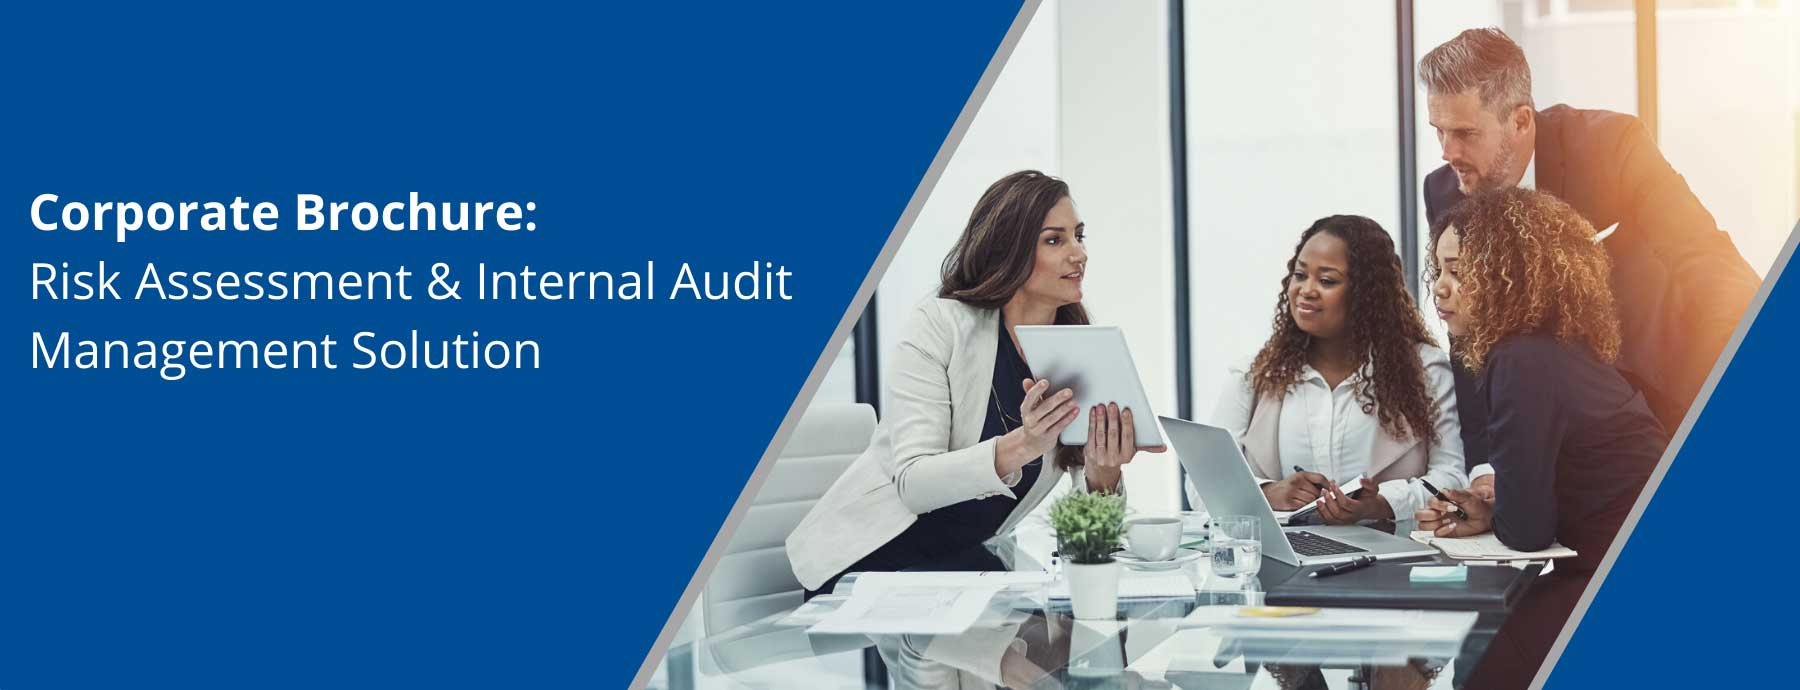 Corporate Brochure – Risk Assessment & Internal Audit Management Solution